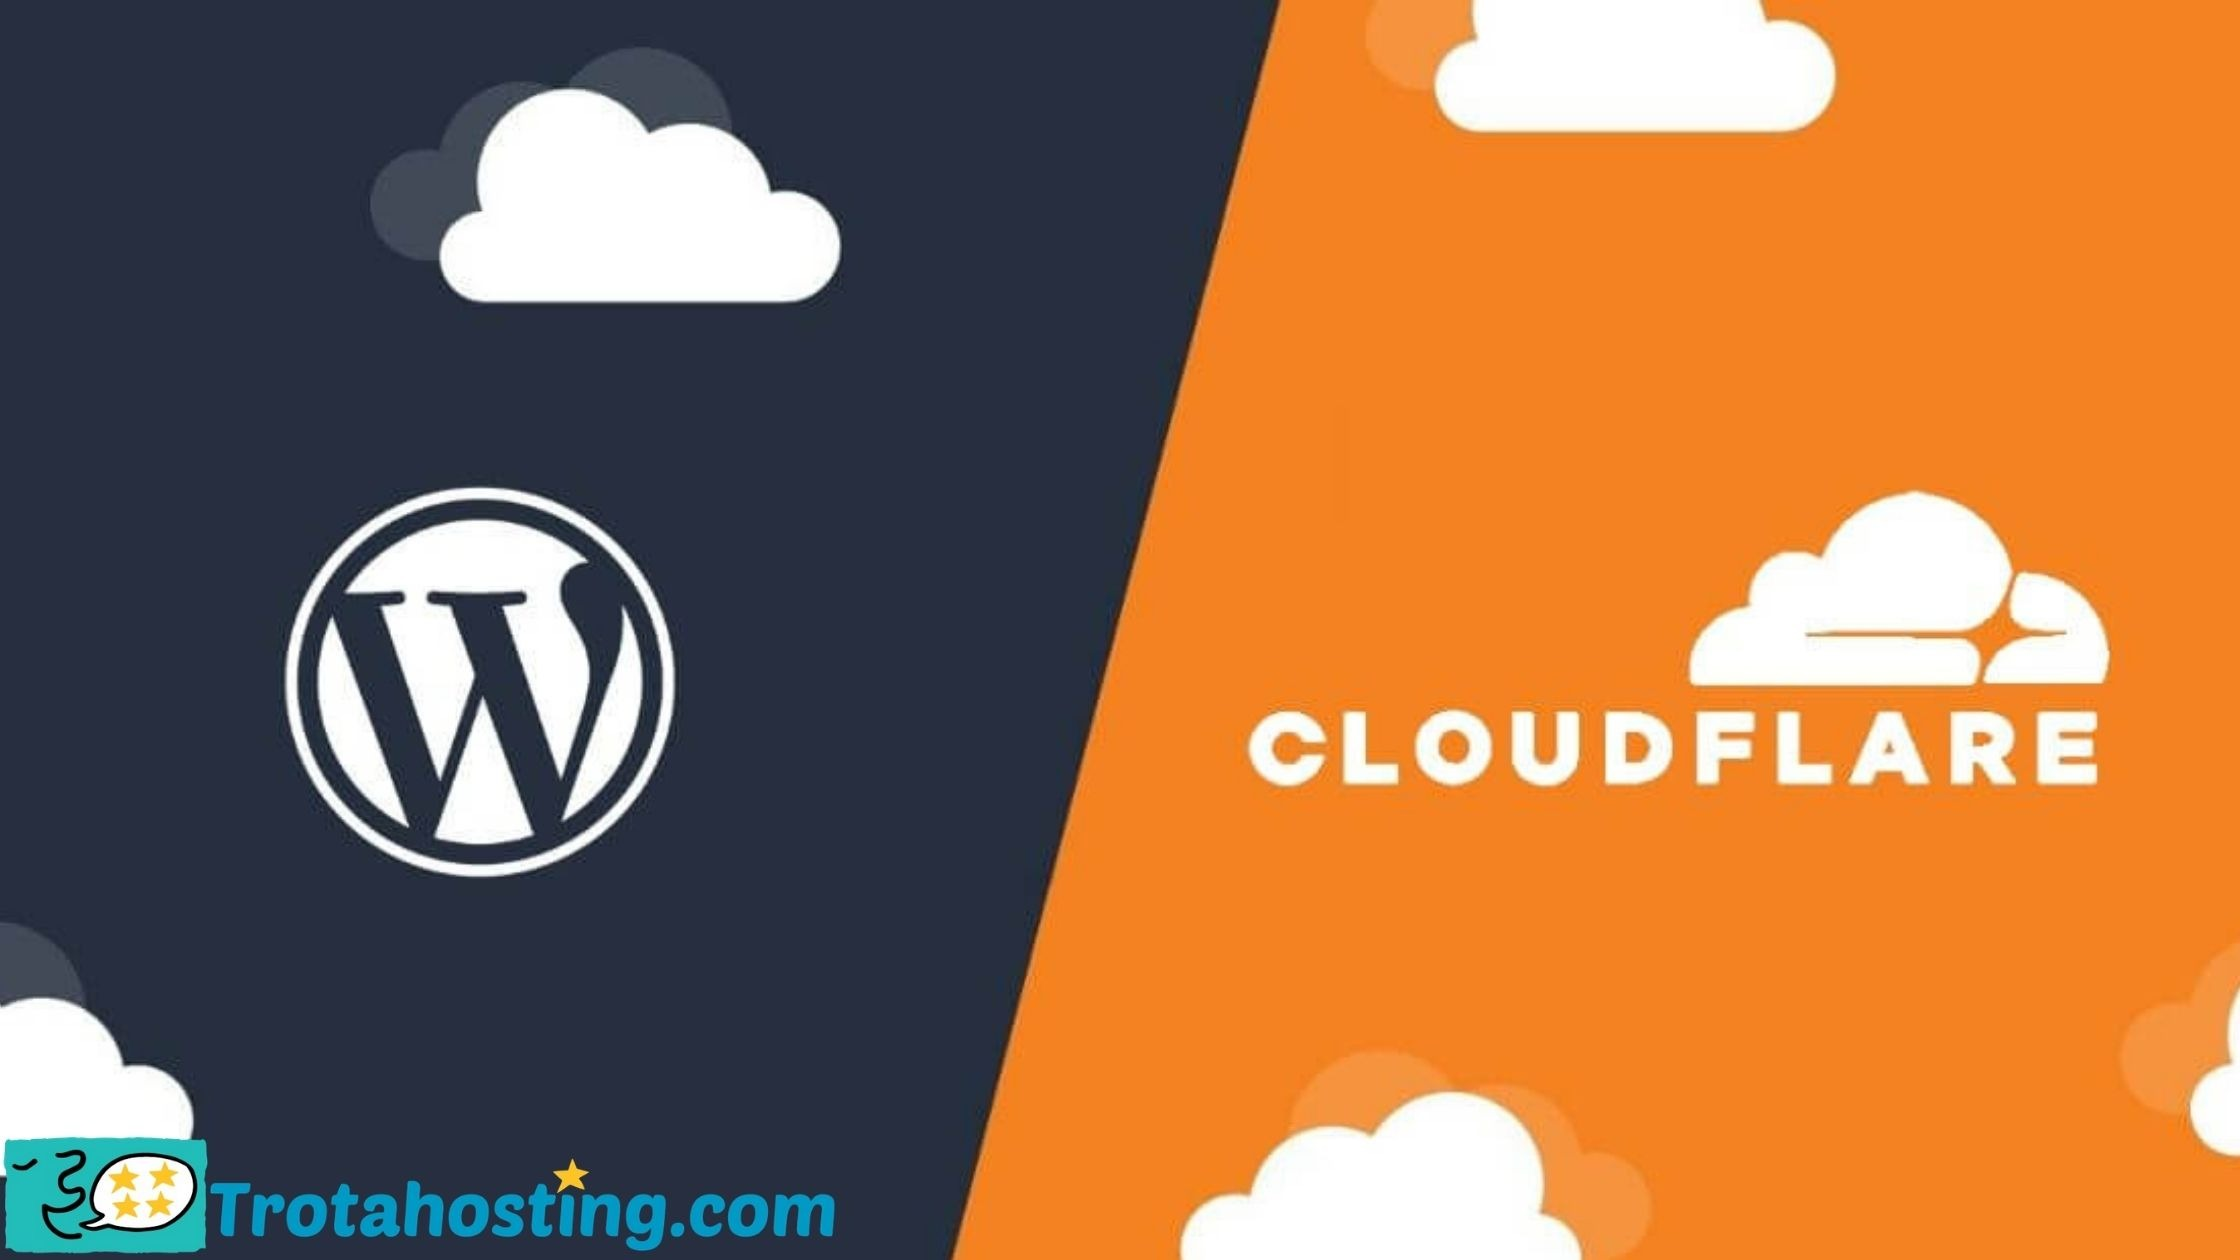 Configurar cloudflare wordpress